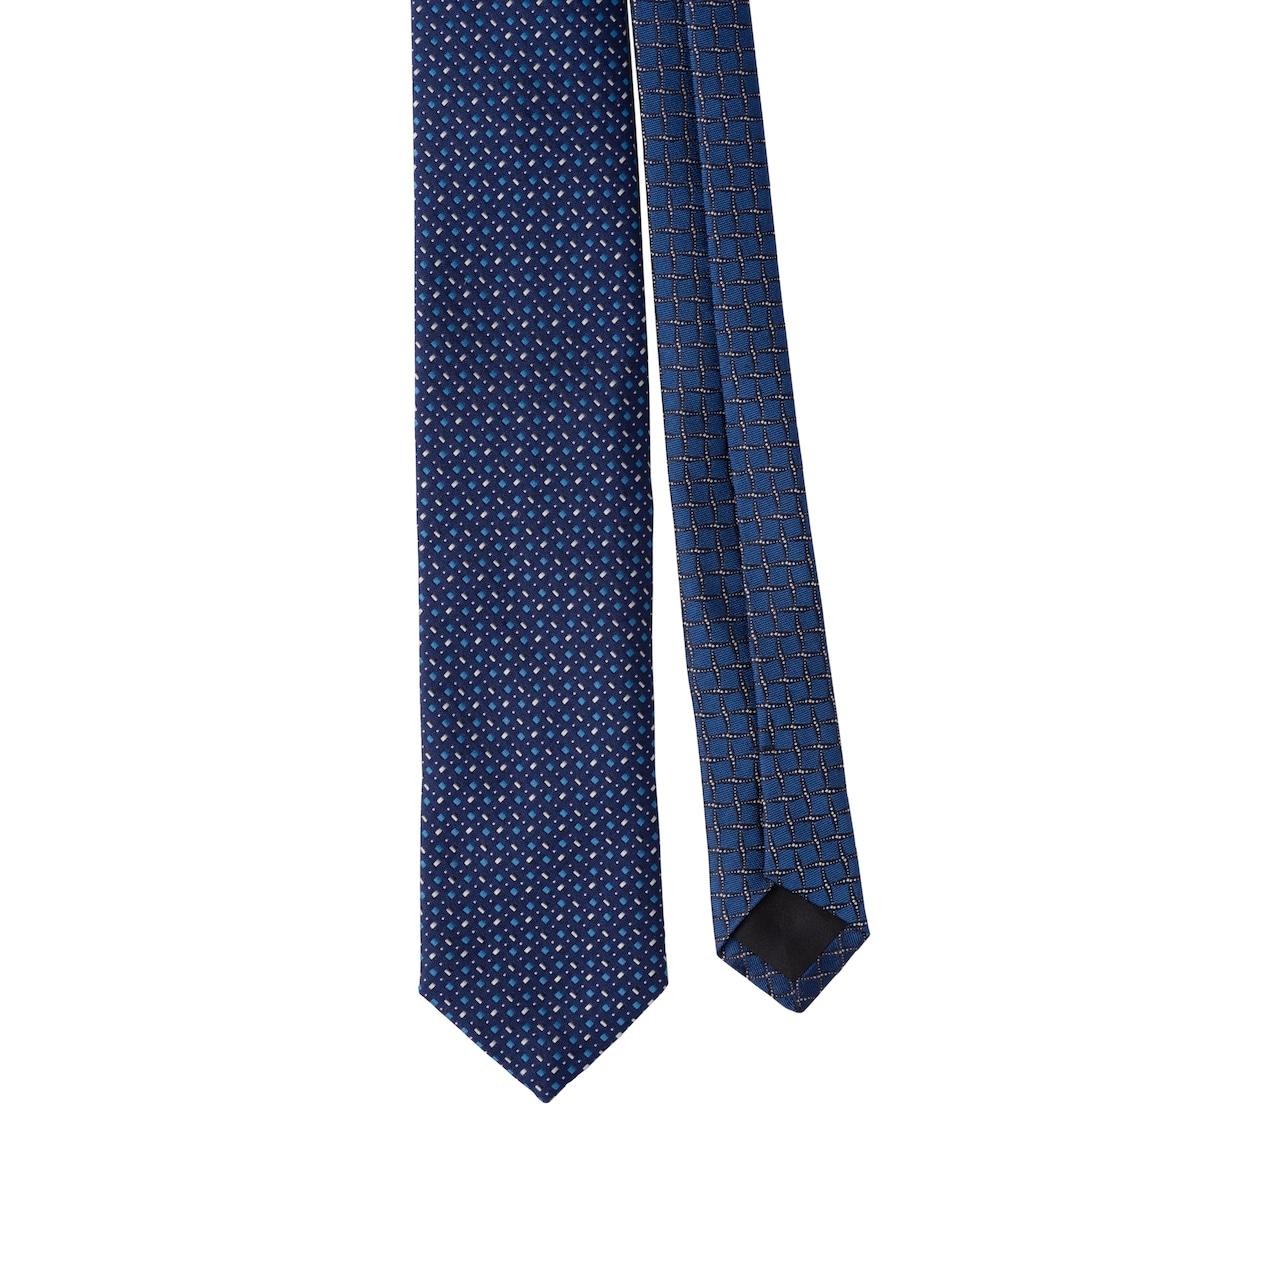 Tie with jacquard motifs